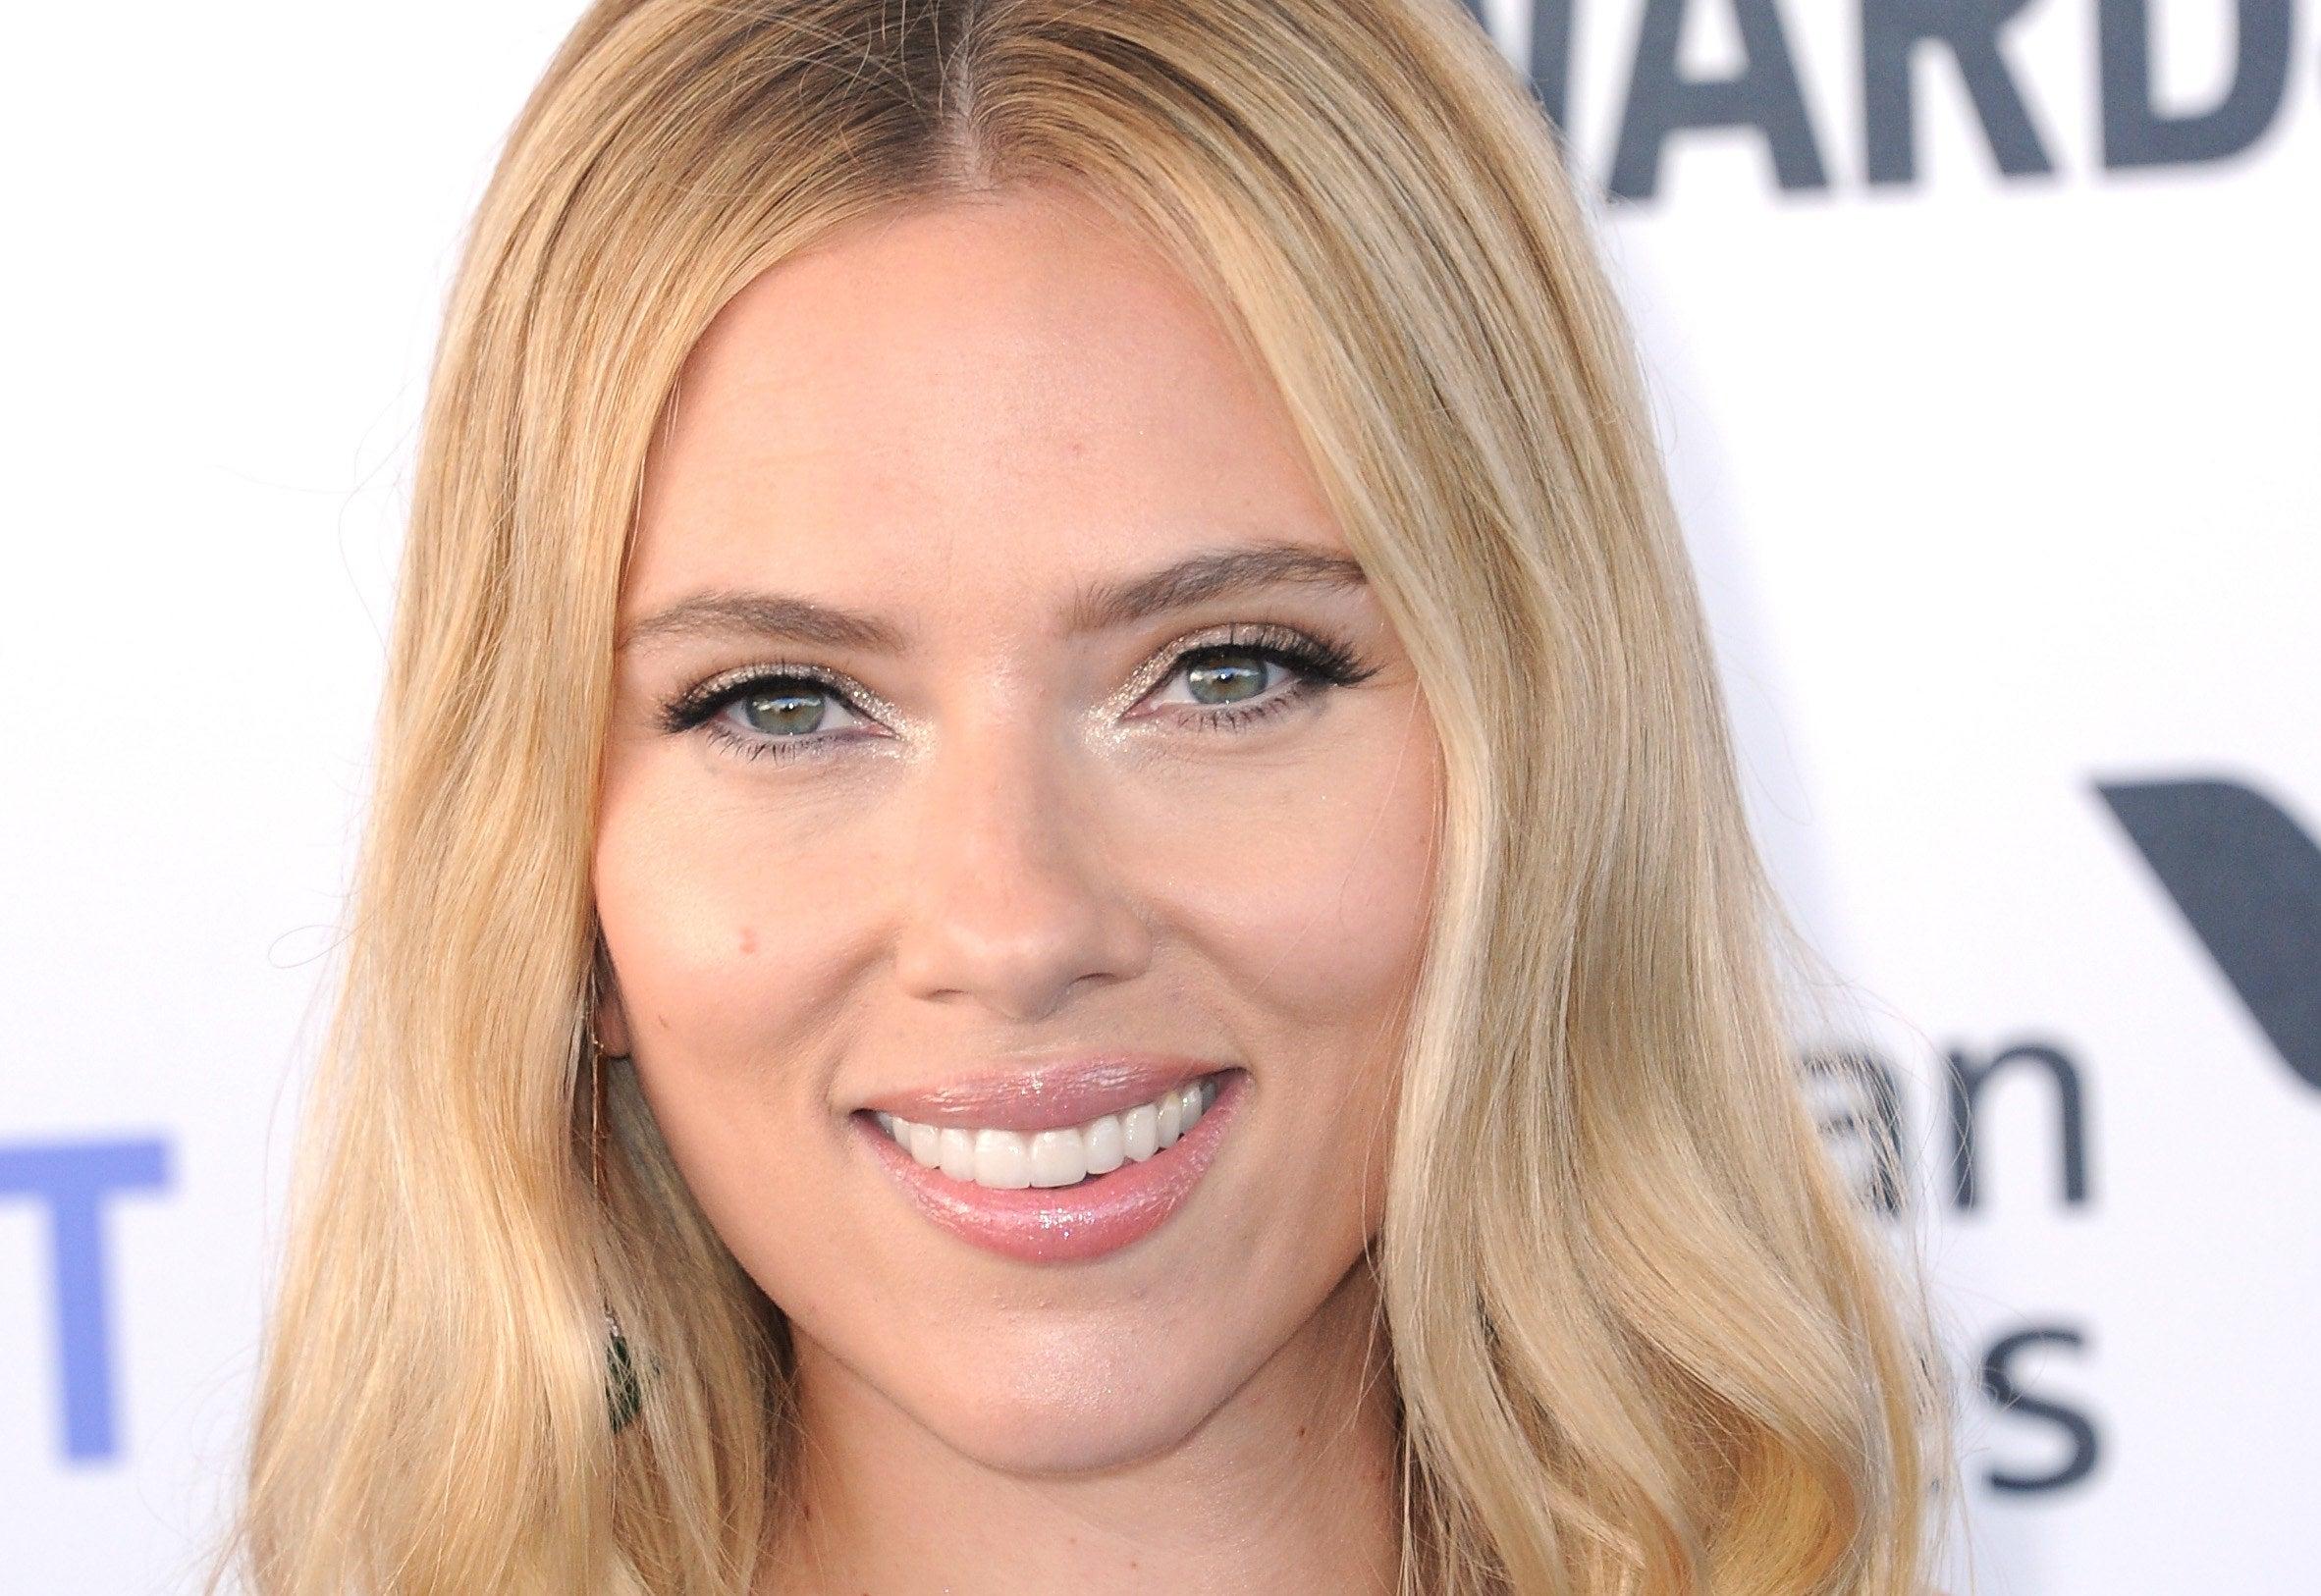 Photo of Scarlett Johansson smiling